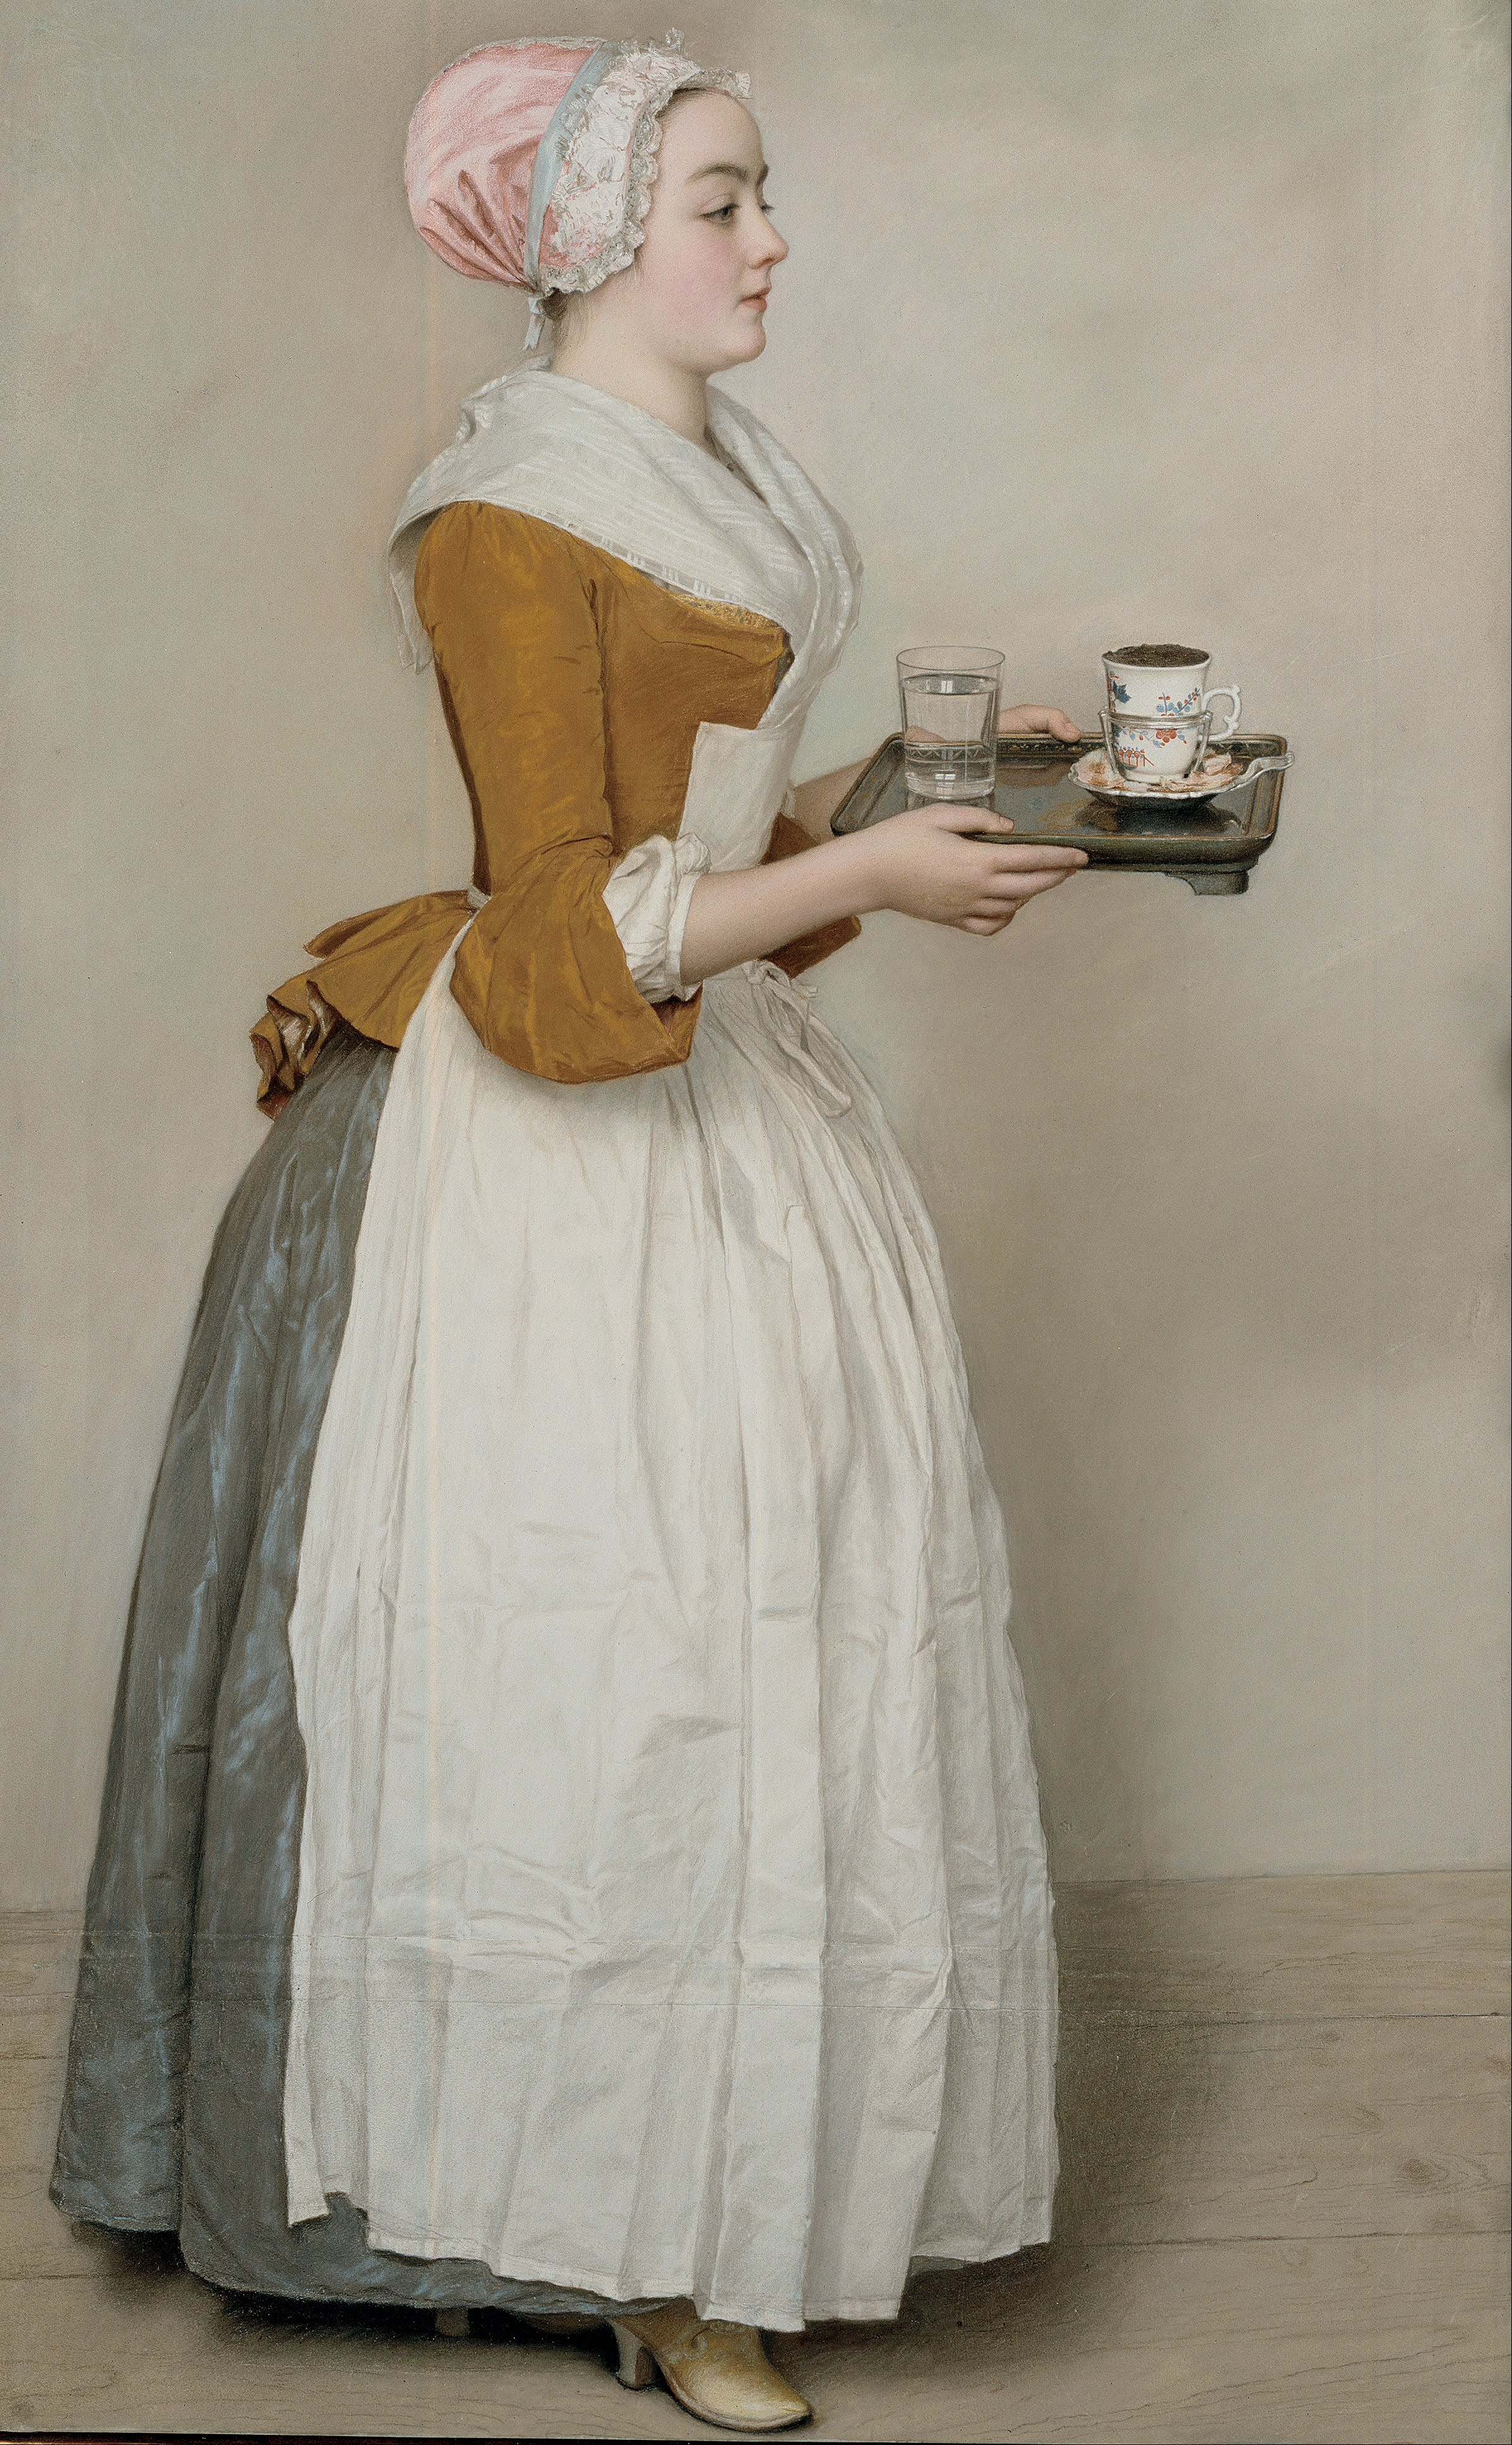 Jean-Etienne_Liotard la belle chocolatiere